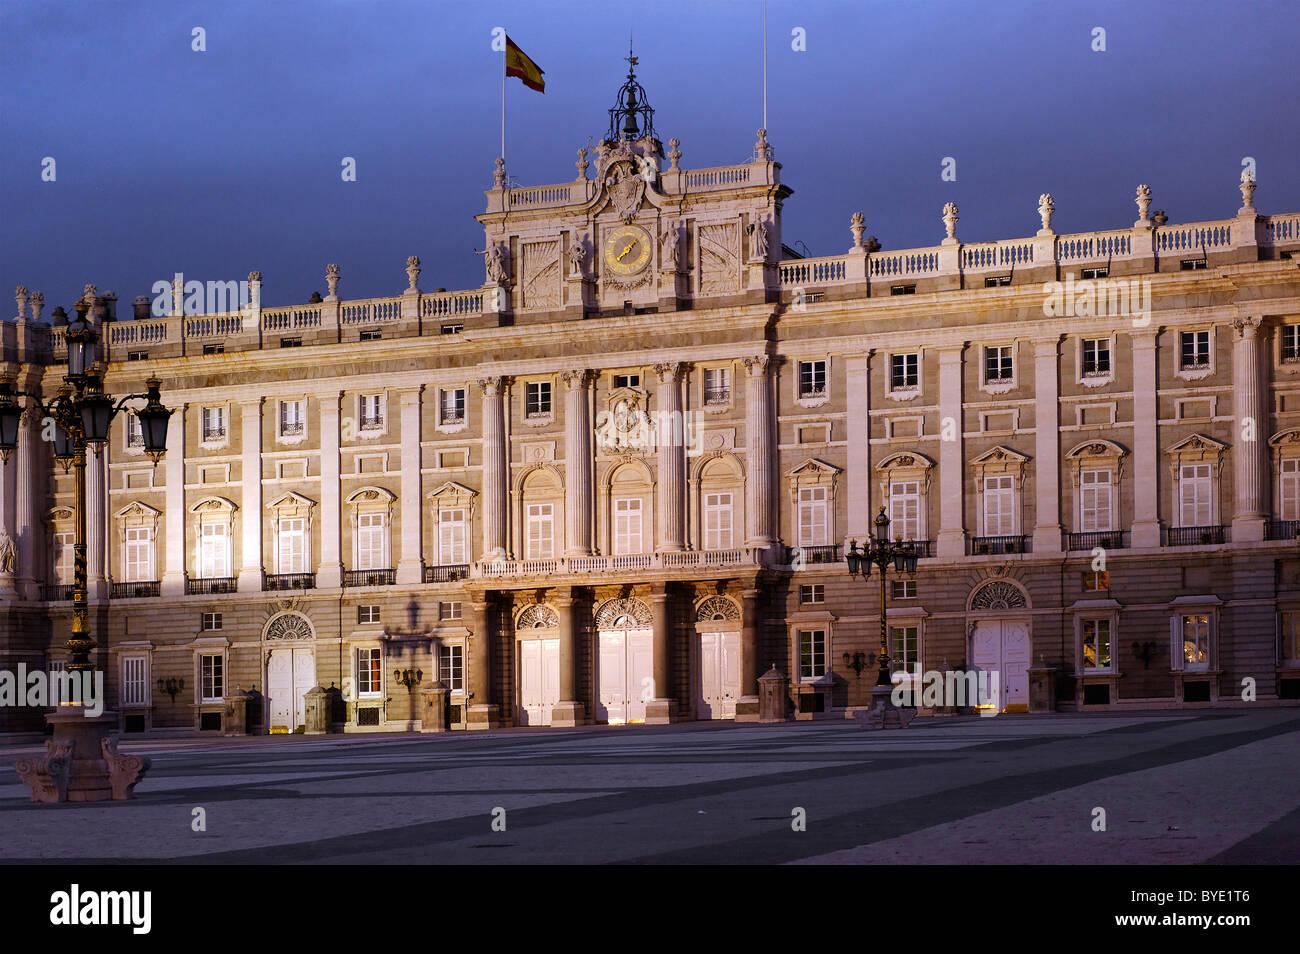 Palacio Real, Royal Palace, Madrid, Spain, Europe - Stock Image